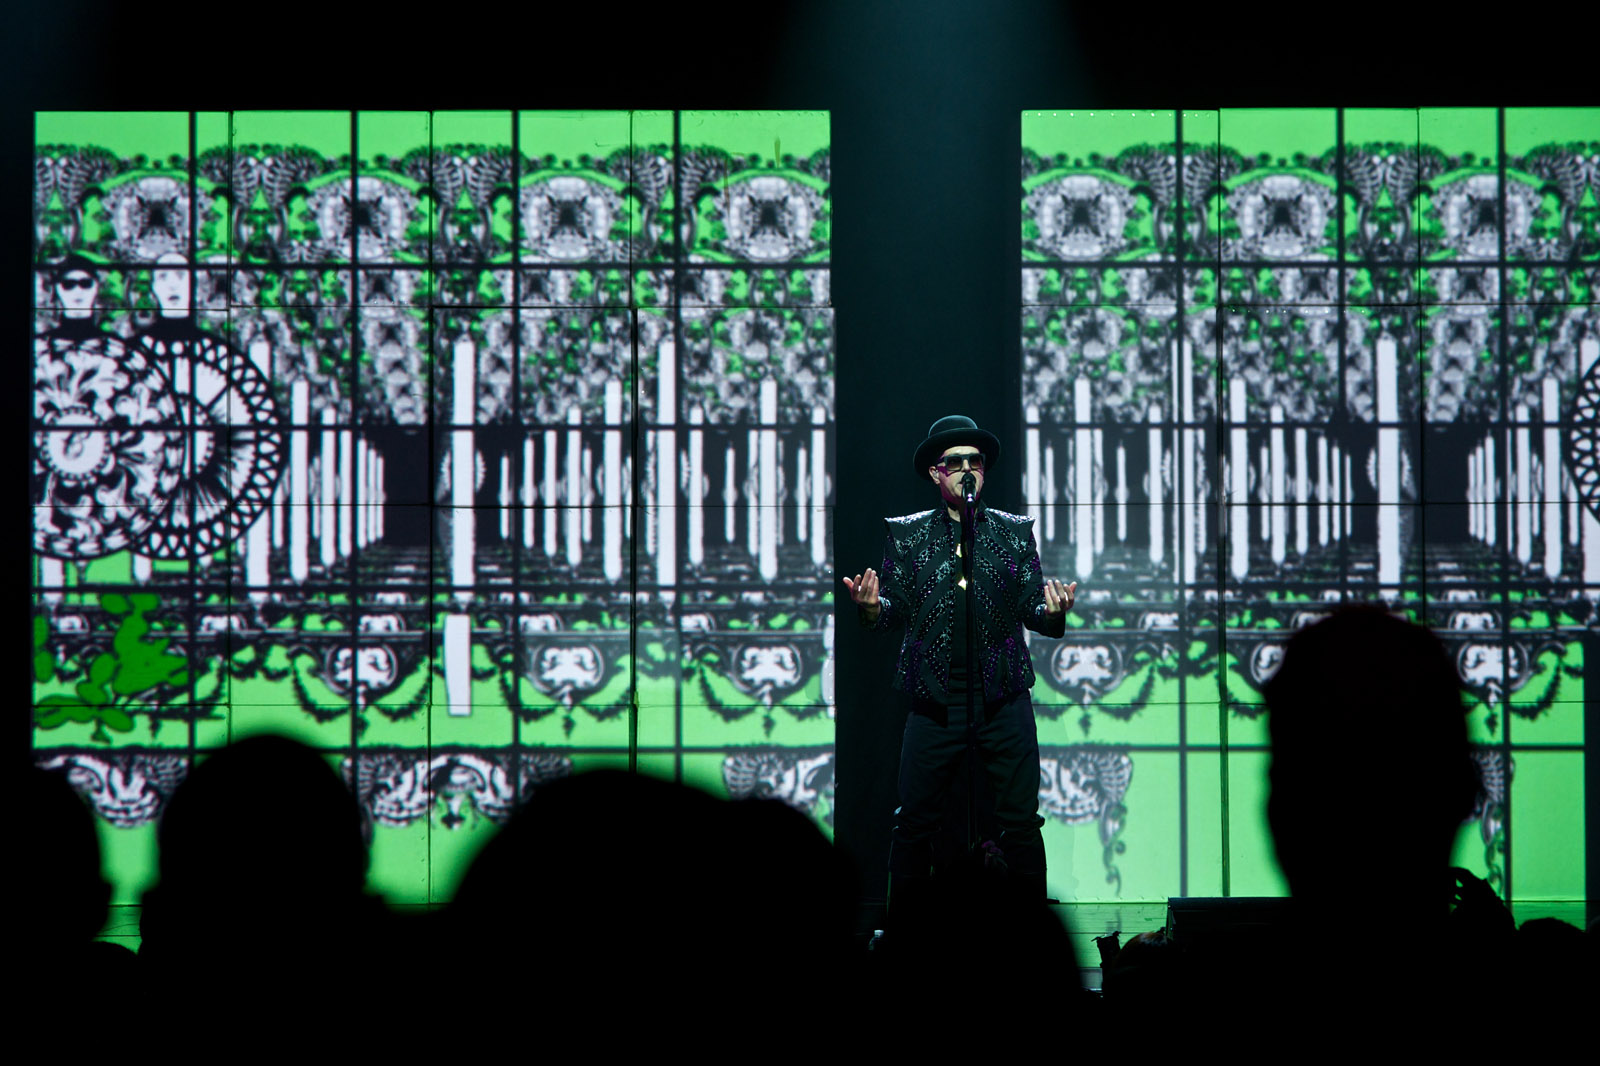 Pet Shop Boys, San Francisco, 2009